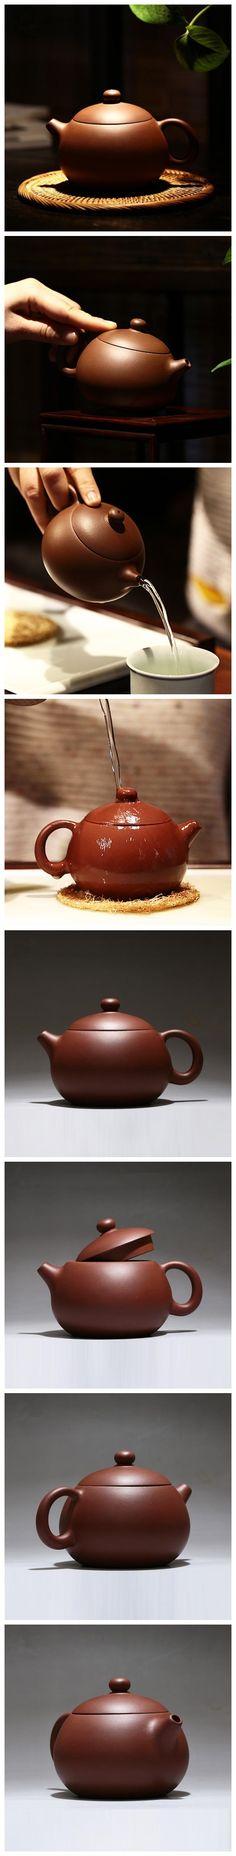 Handmade Yixing Zisha clay teapot uses purple clay aged for more than 10 years.